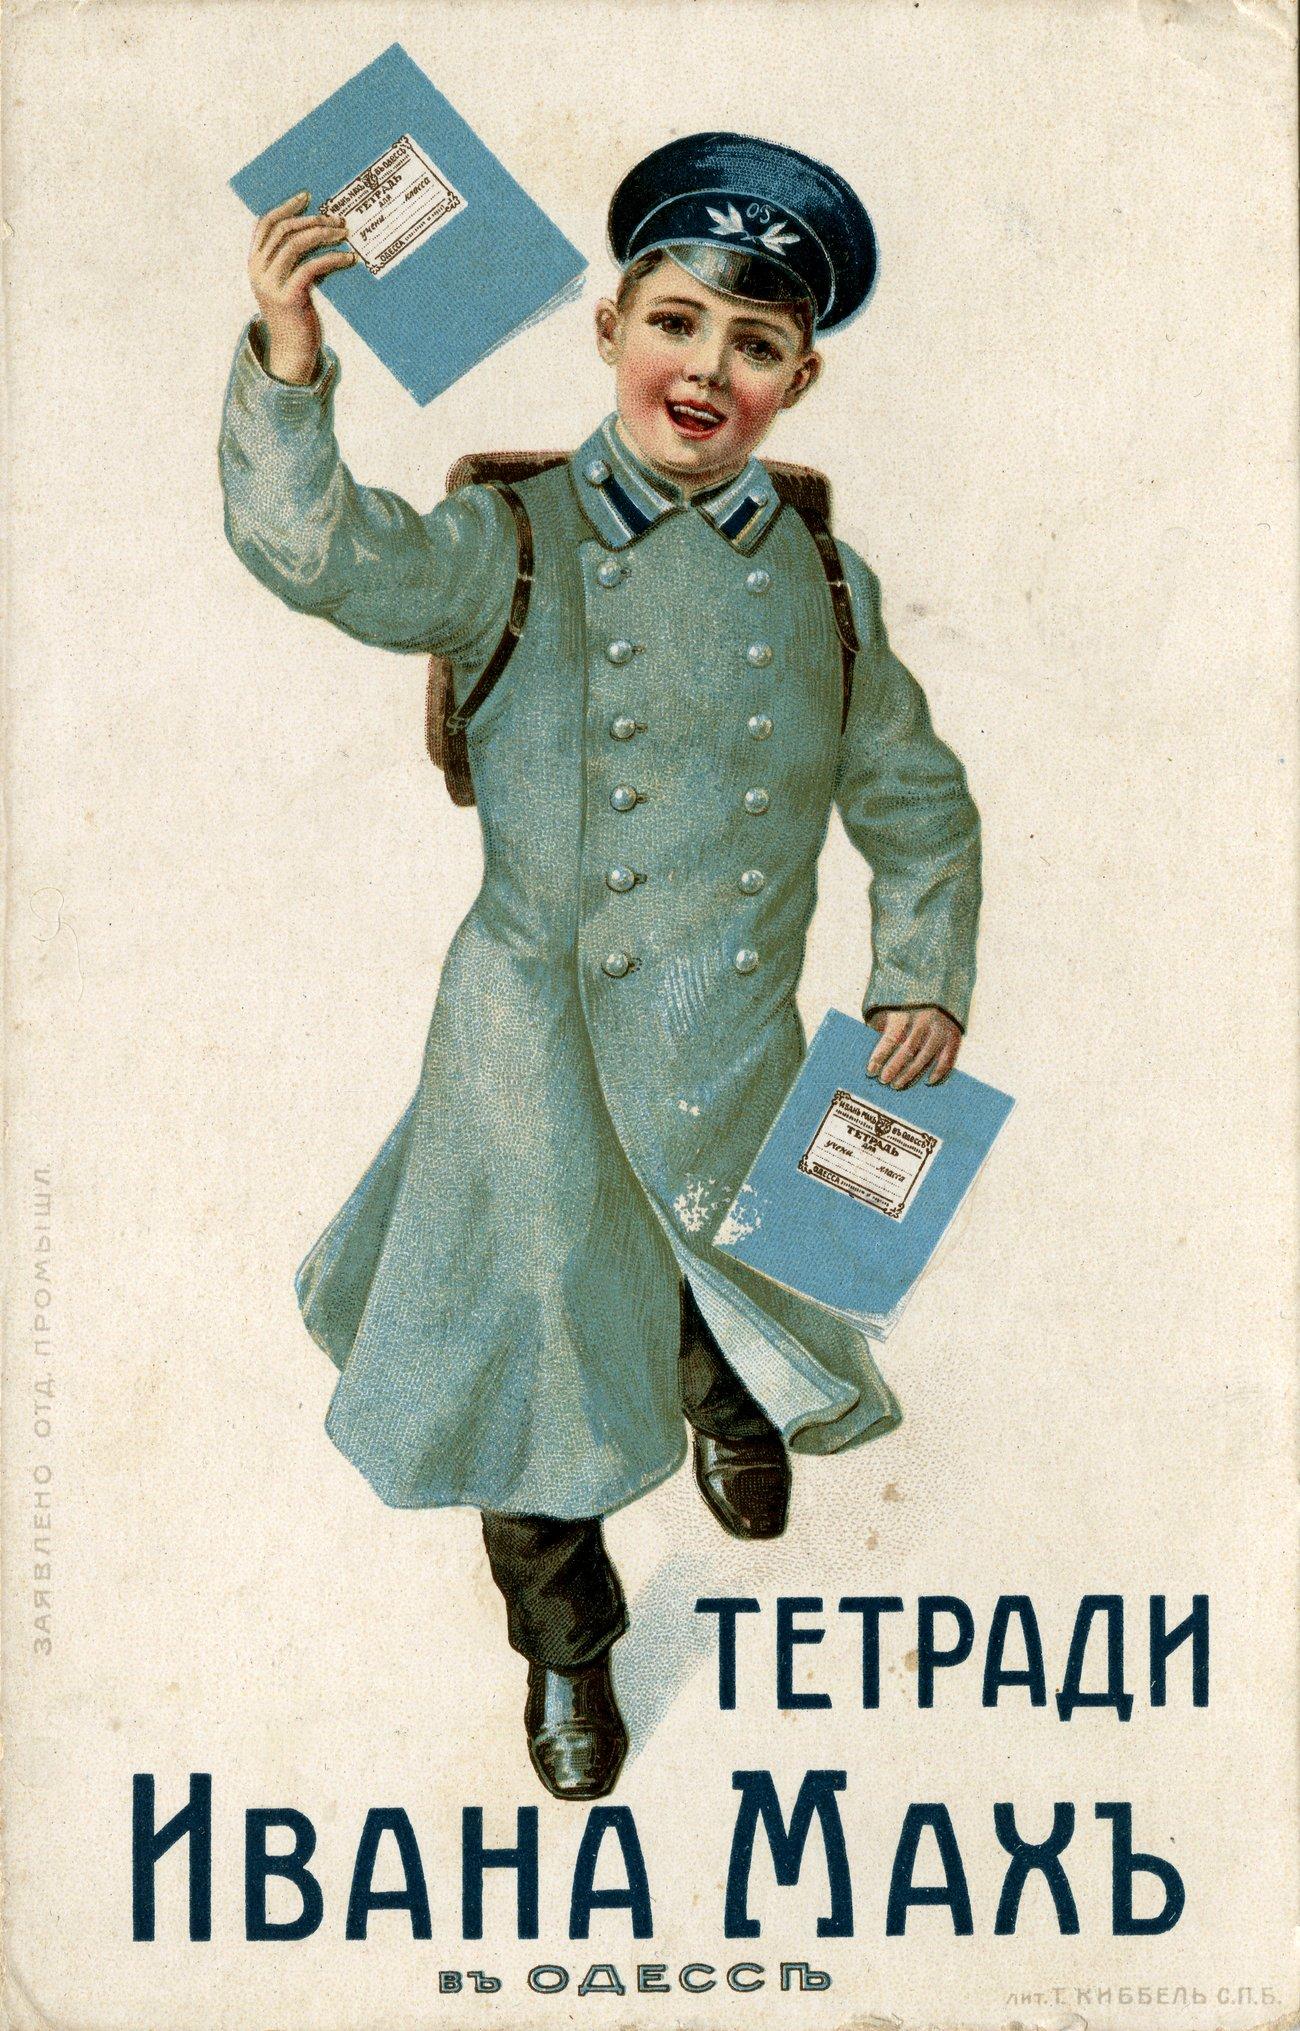 Открытка тетради Иван Мах в Одессе, 90х140